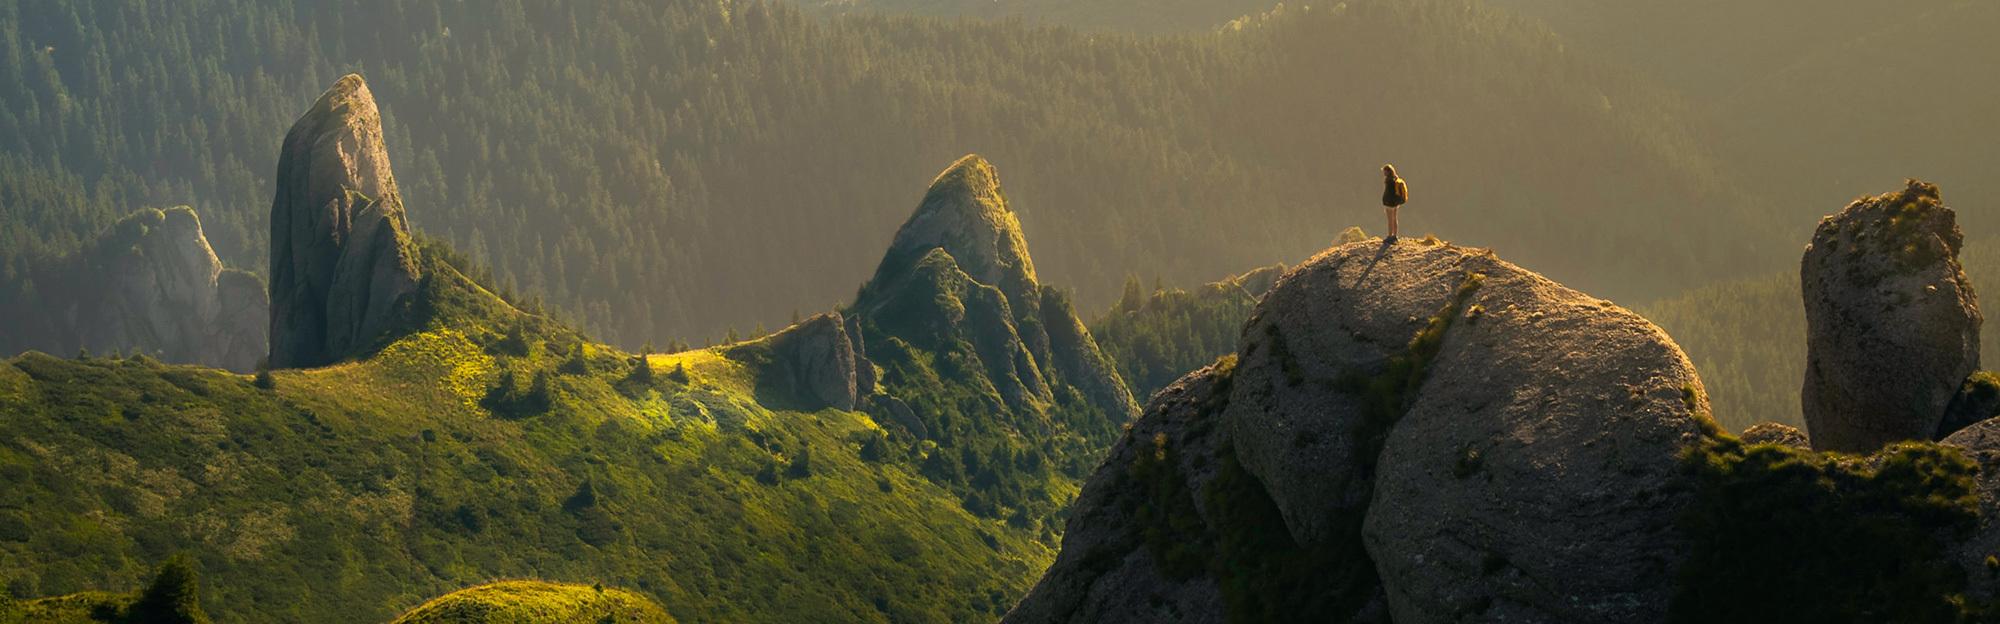 nature mountain view